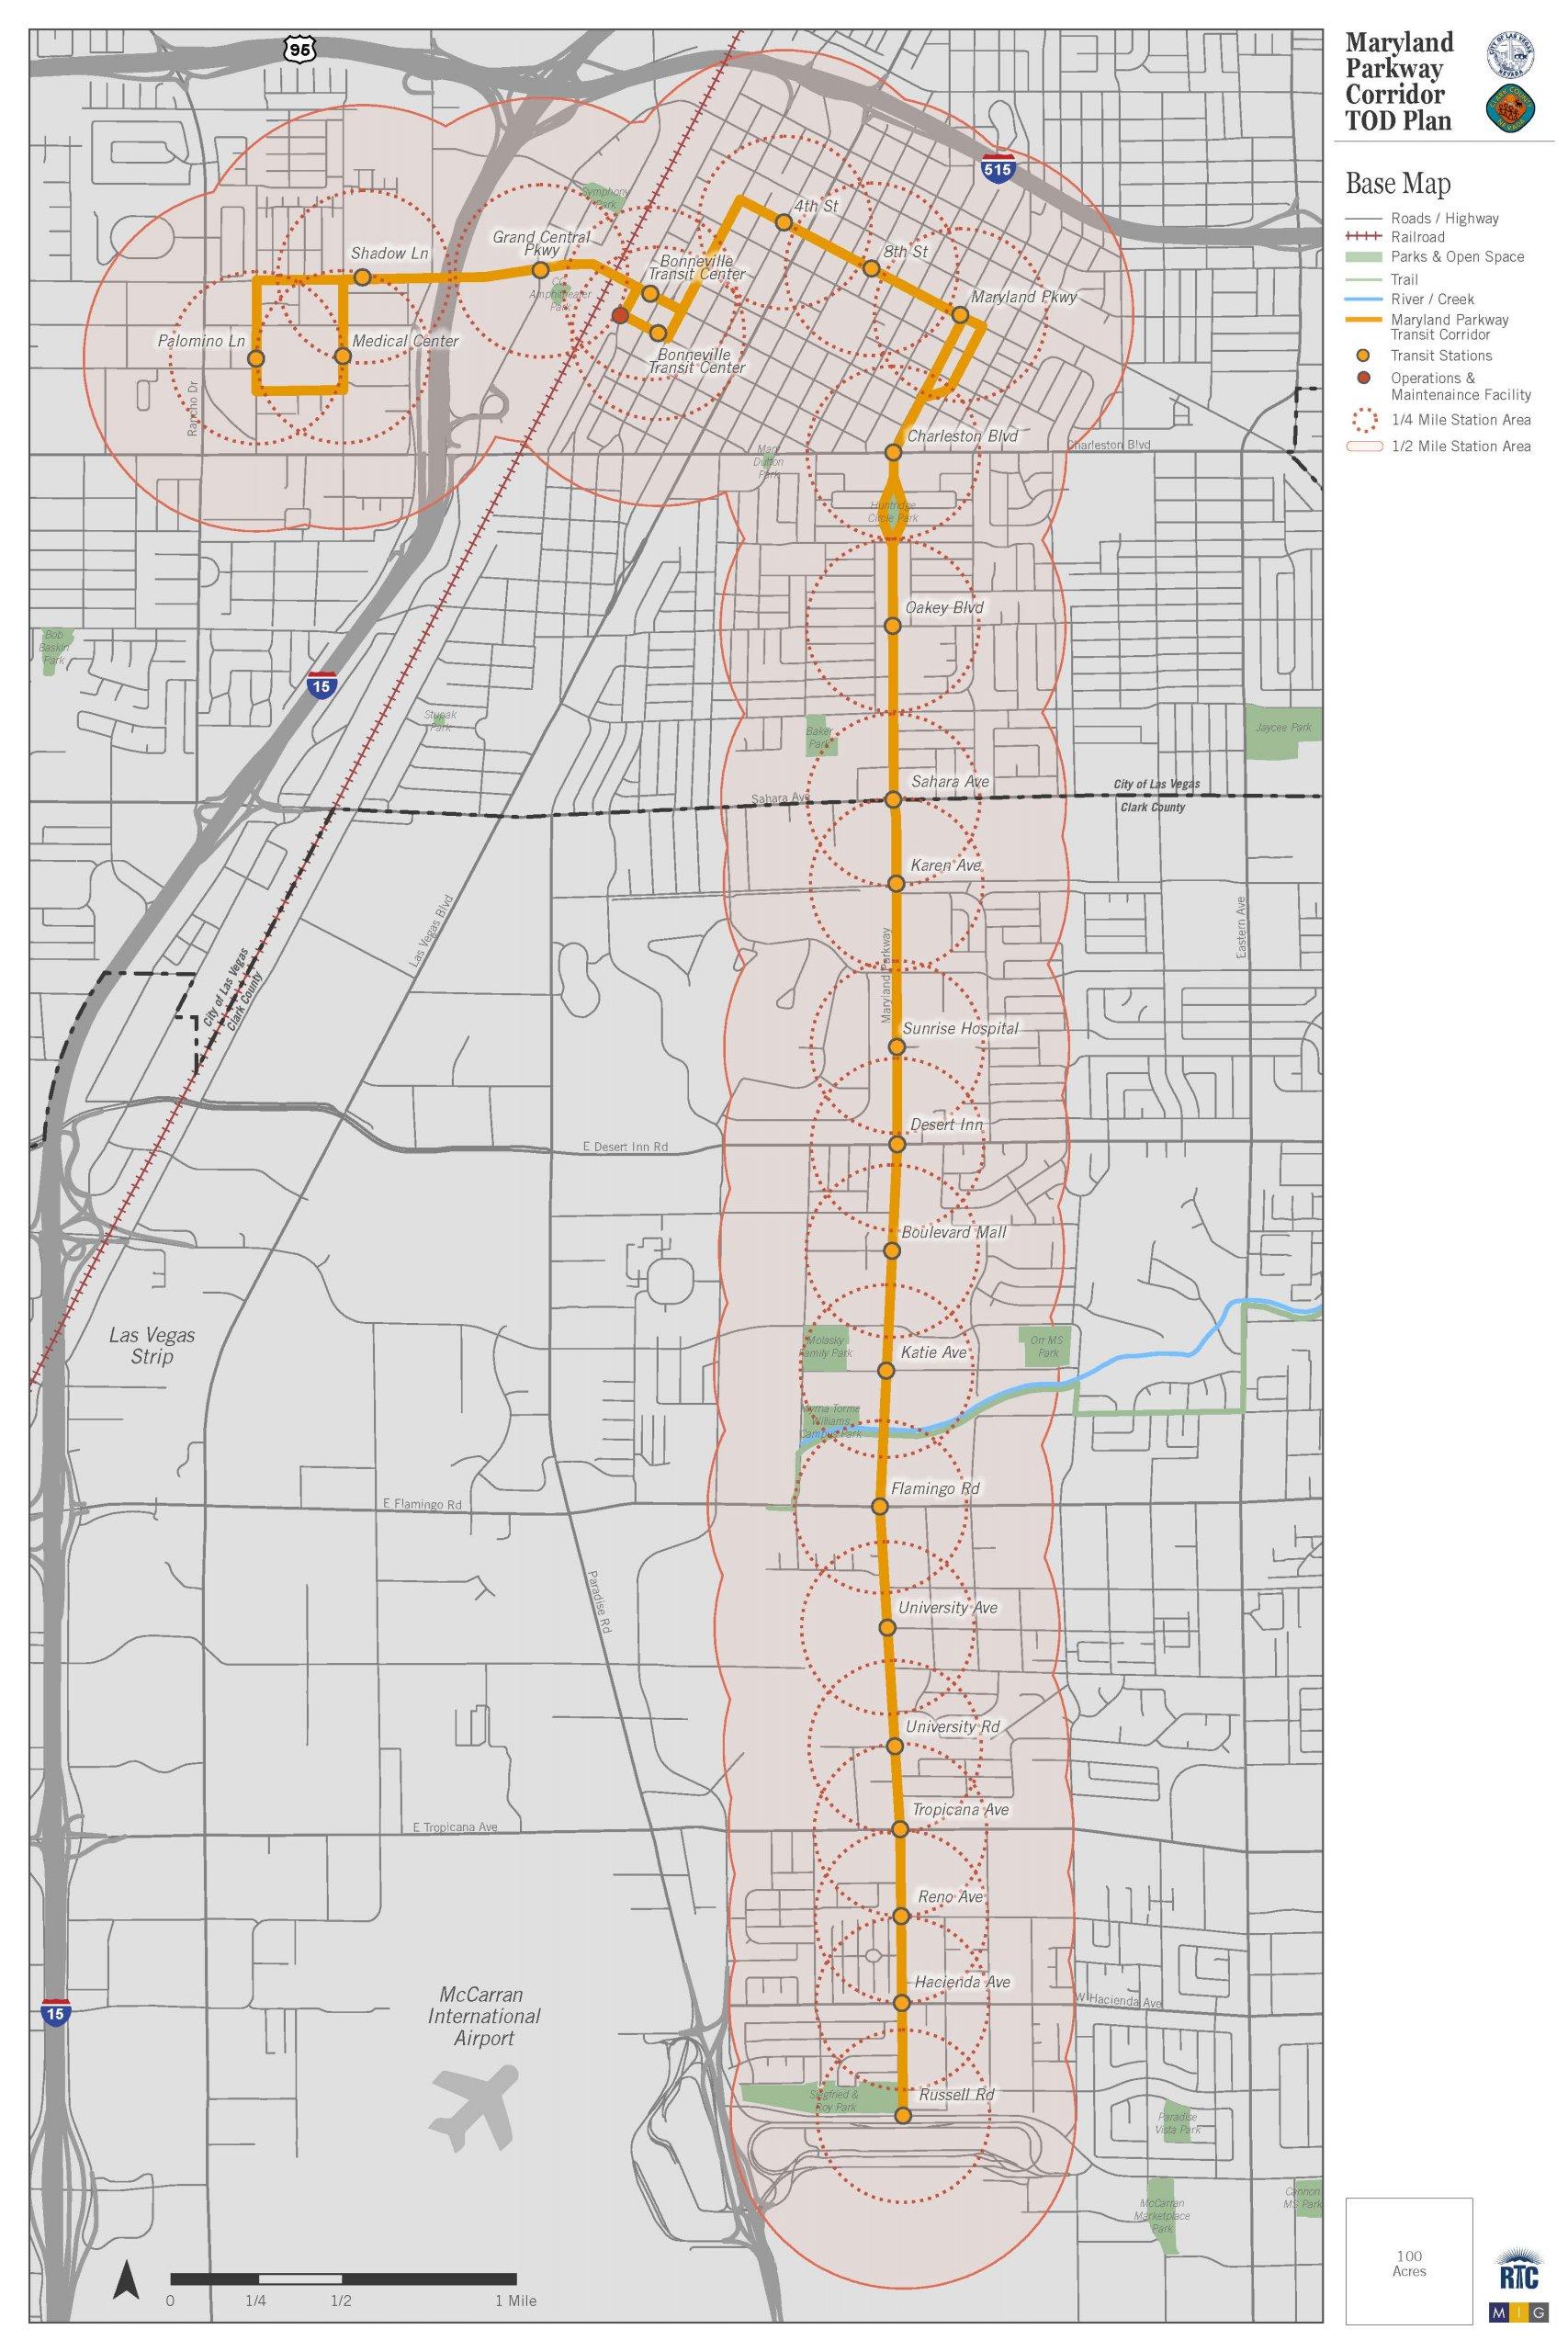 TOD Corridor Map